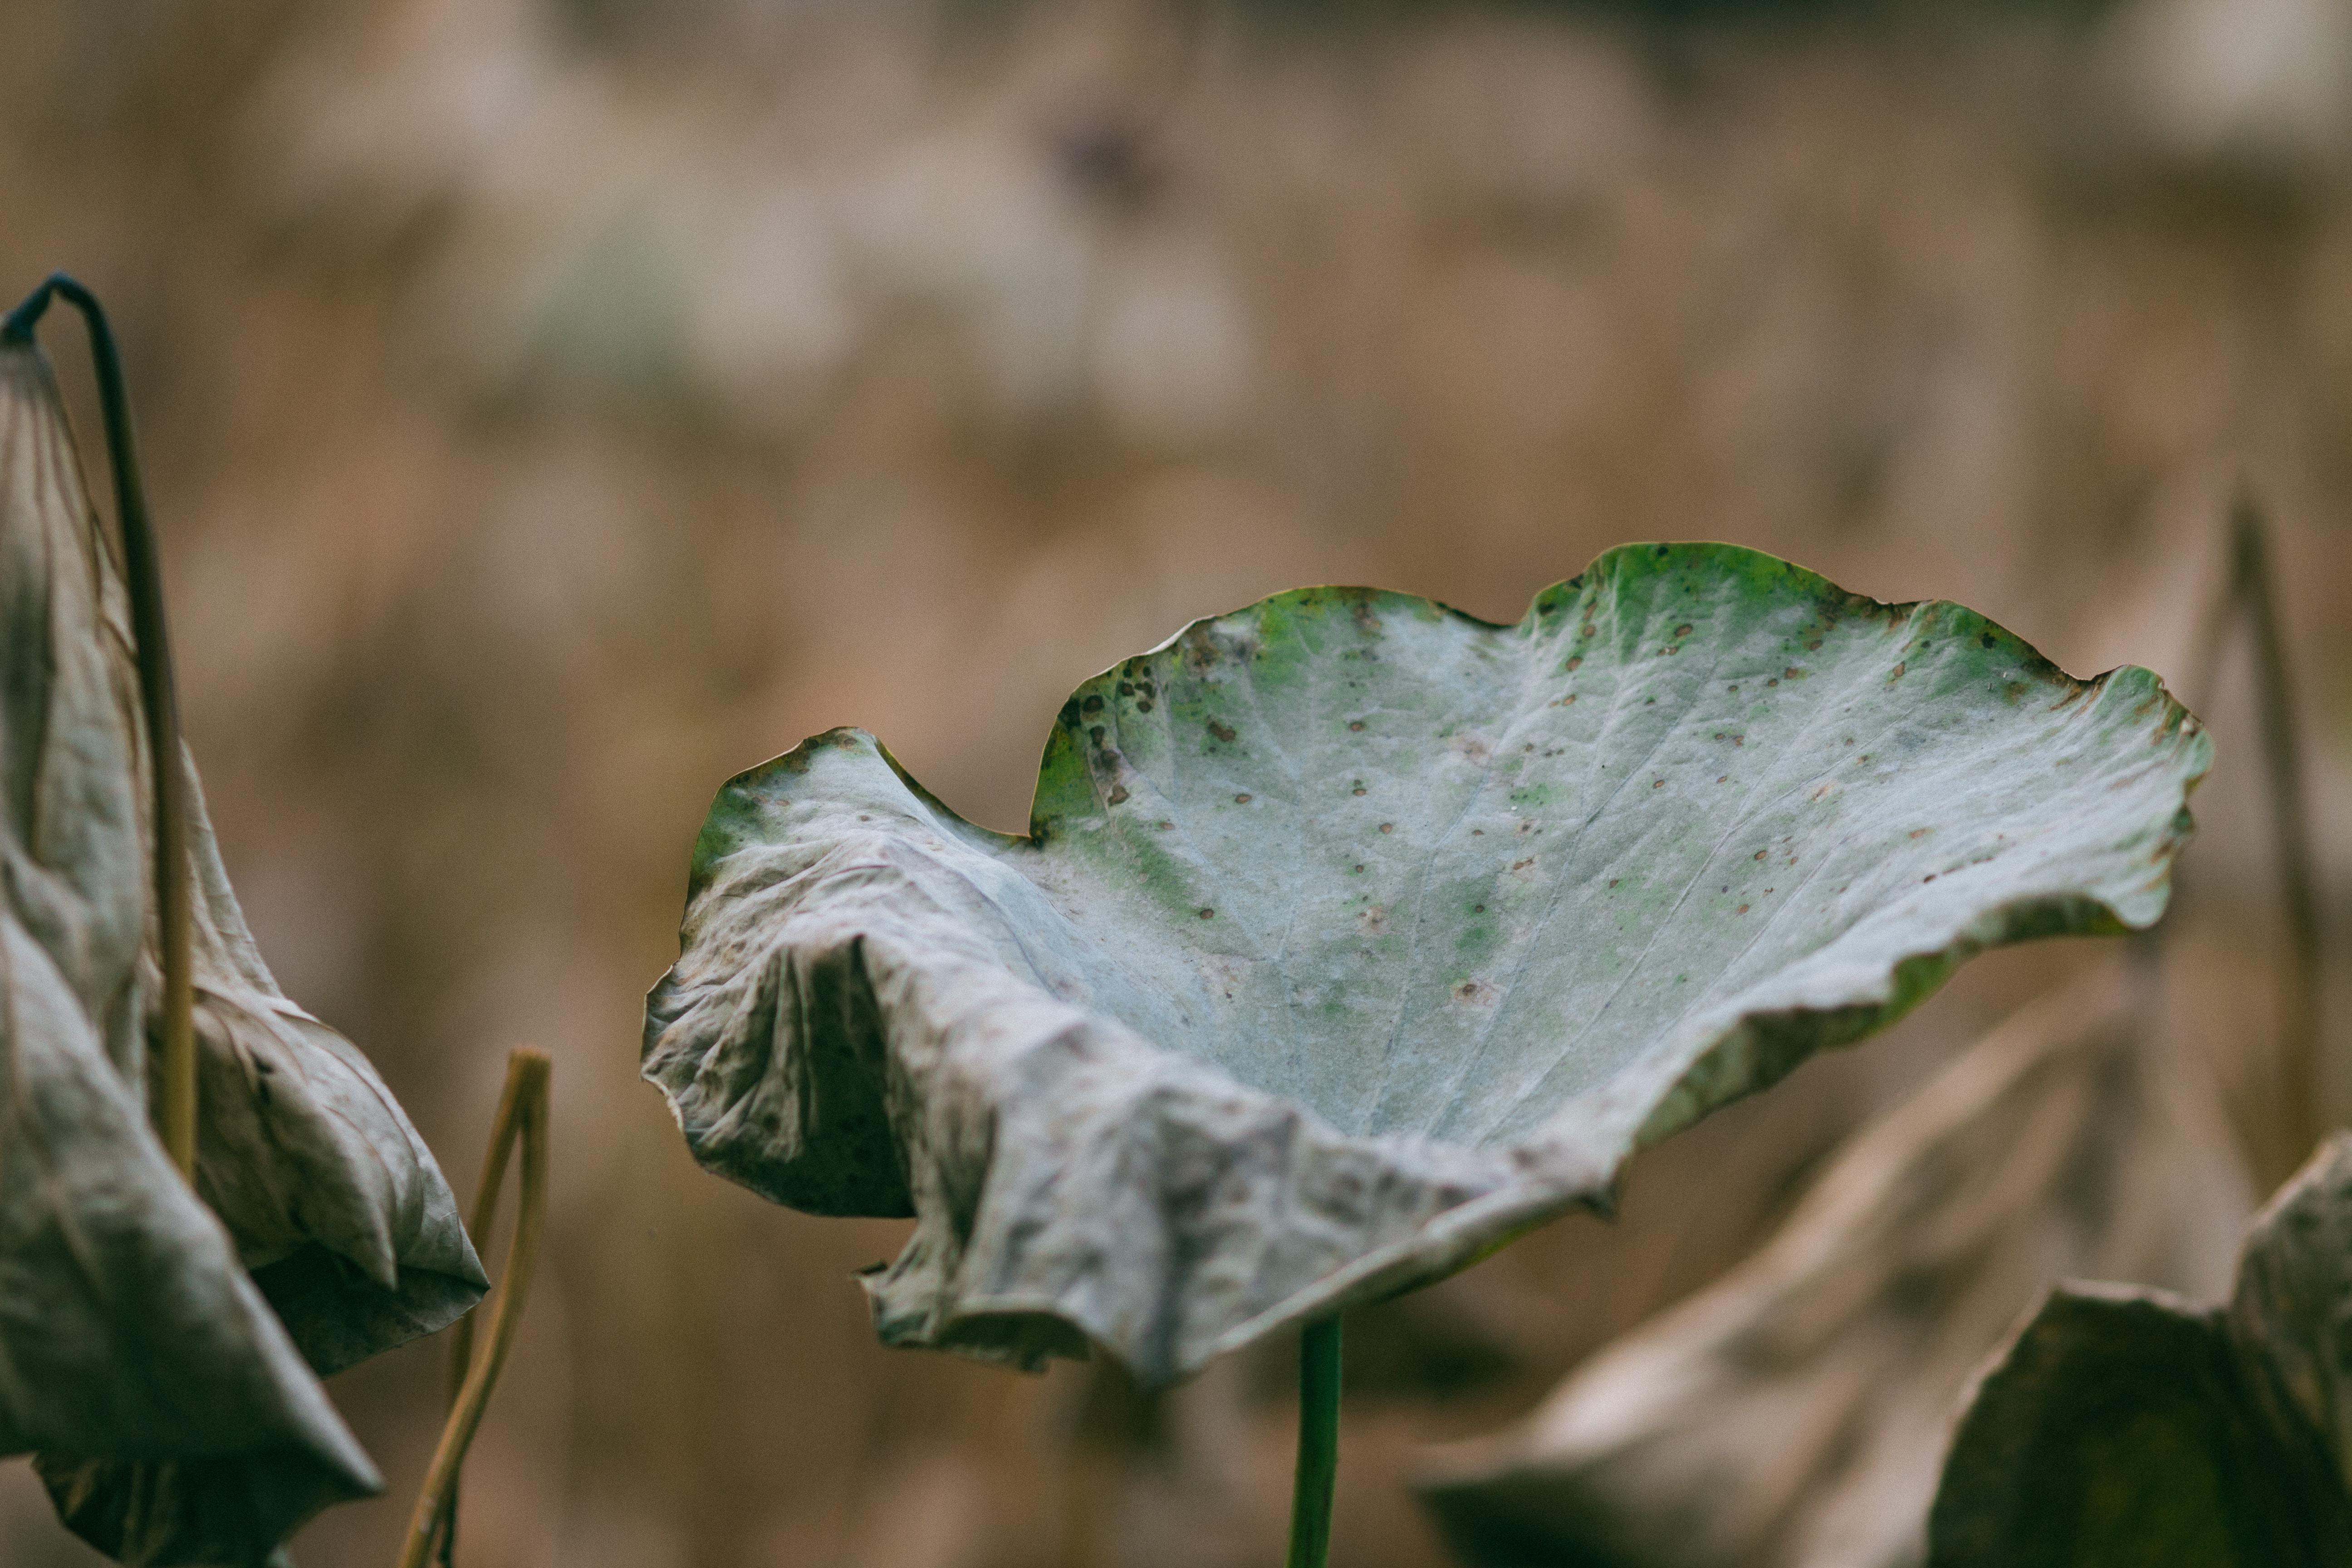 dry plant leaf